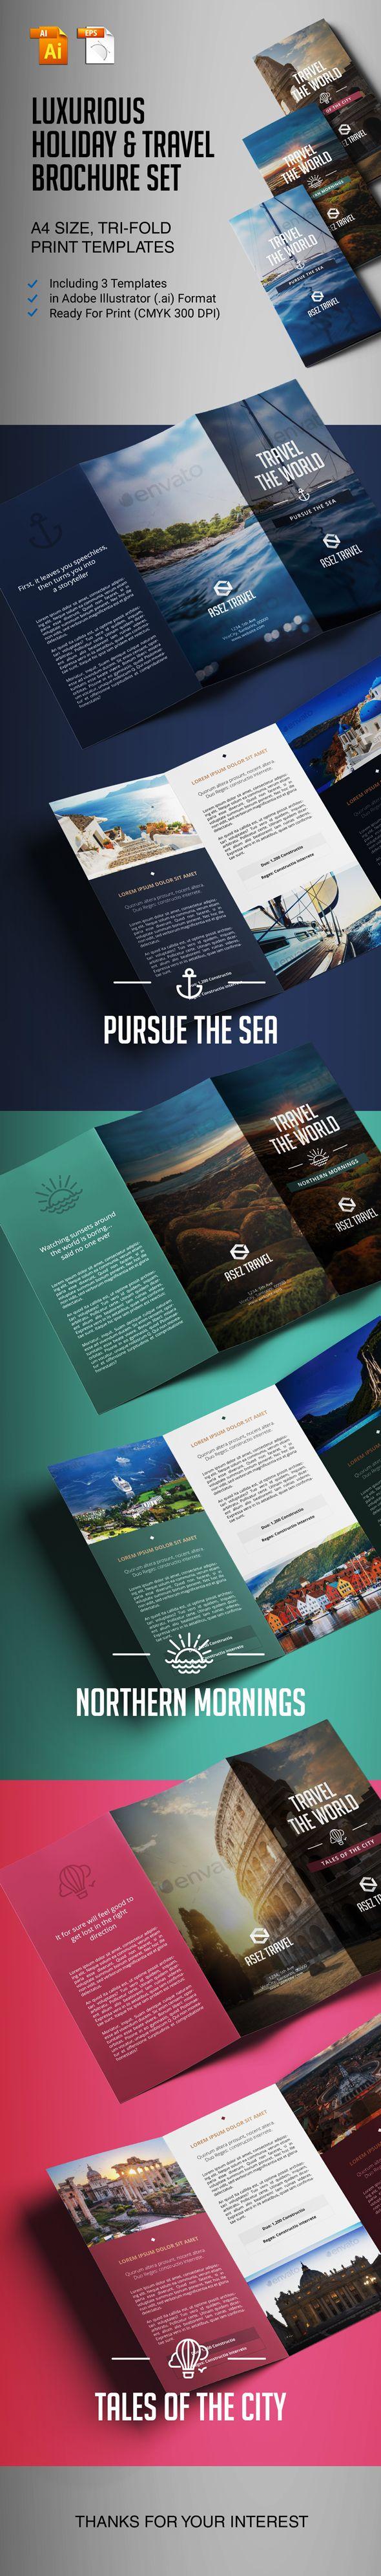 Travel Brochure Set